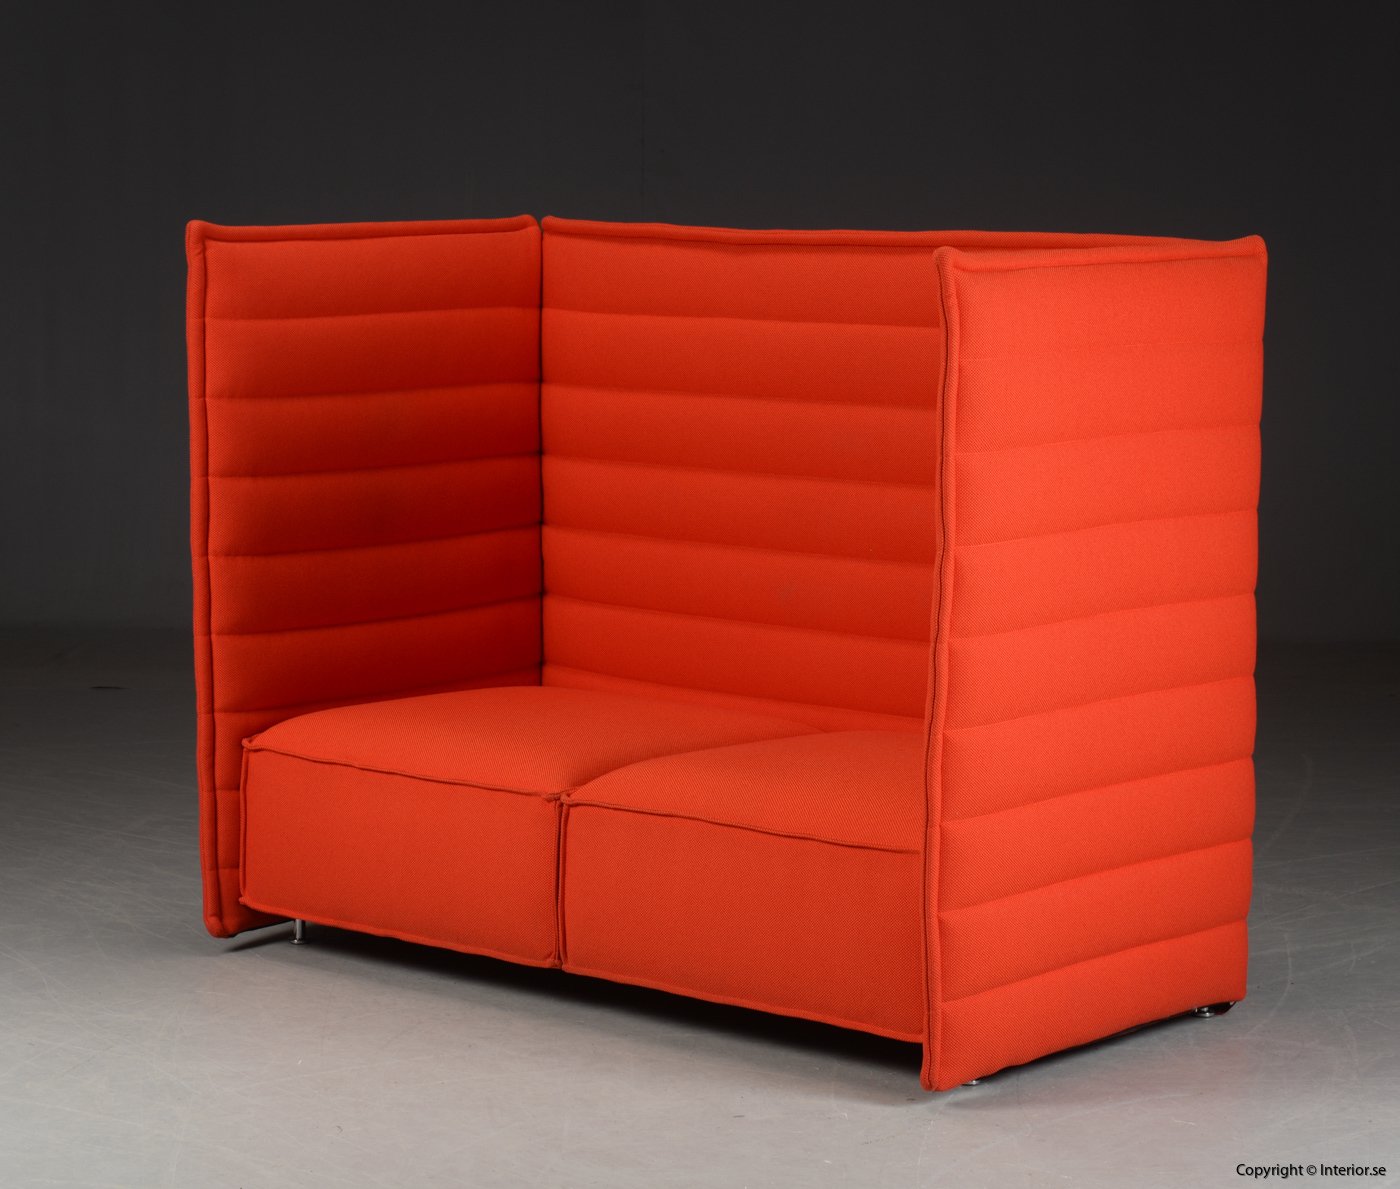 Soffa sofa med hög rygg, Vitra Alcove 2-sits 2 seater - Erwan & Ronan Bouroullec